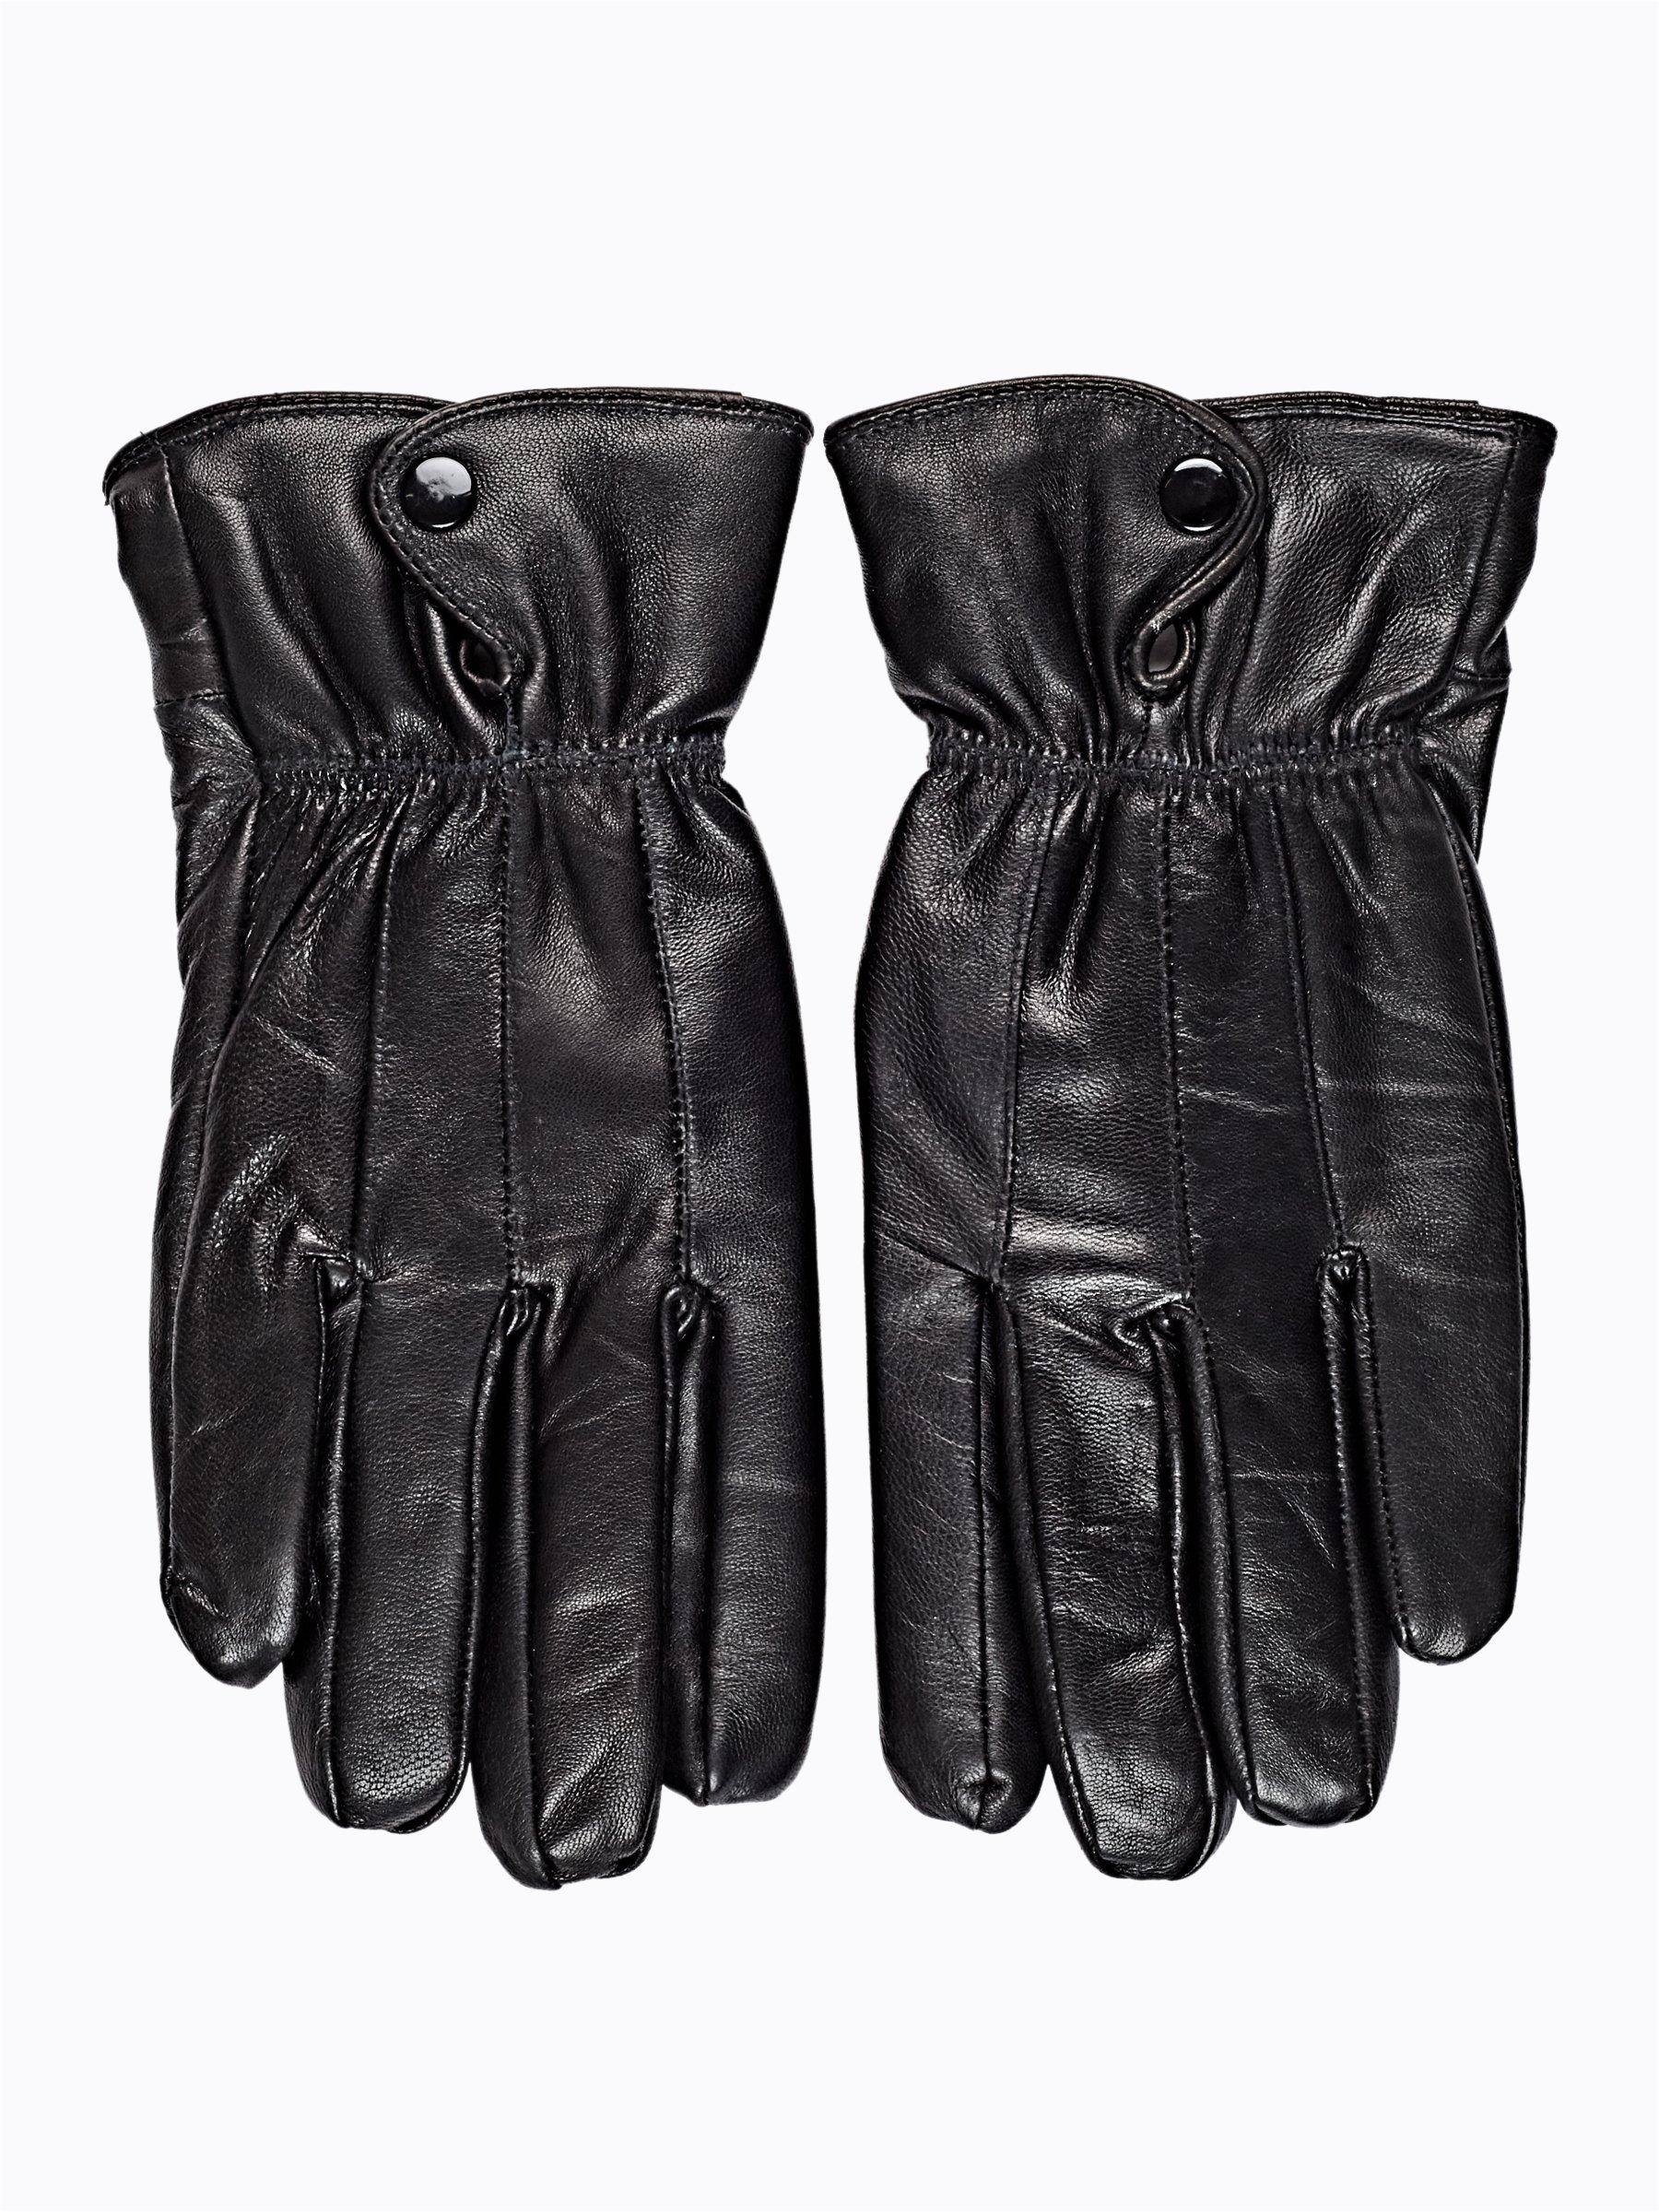 08c519ed4bf8 Kožené rukavice s plyšovou podšívkou